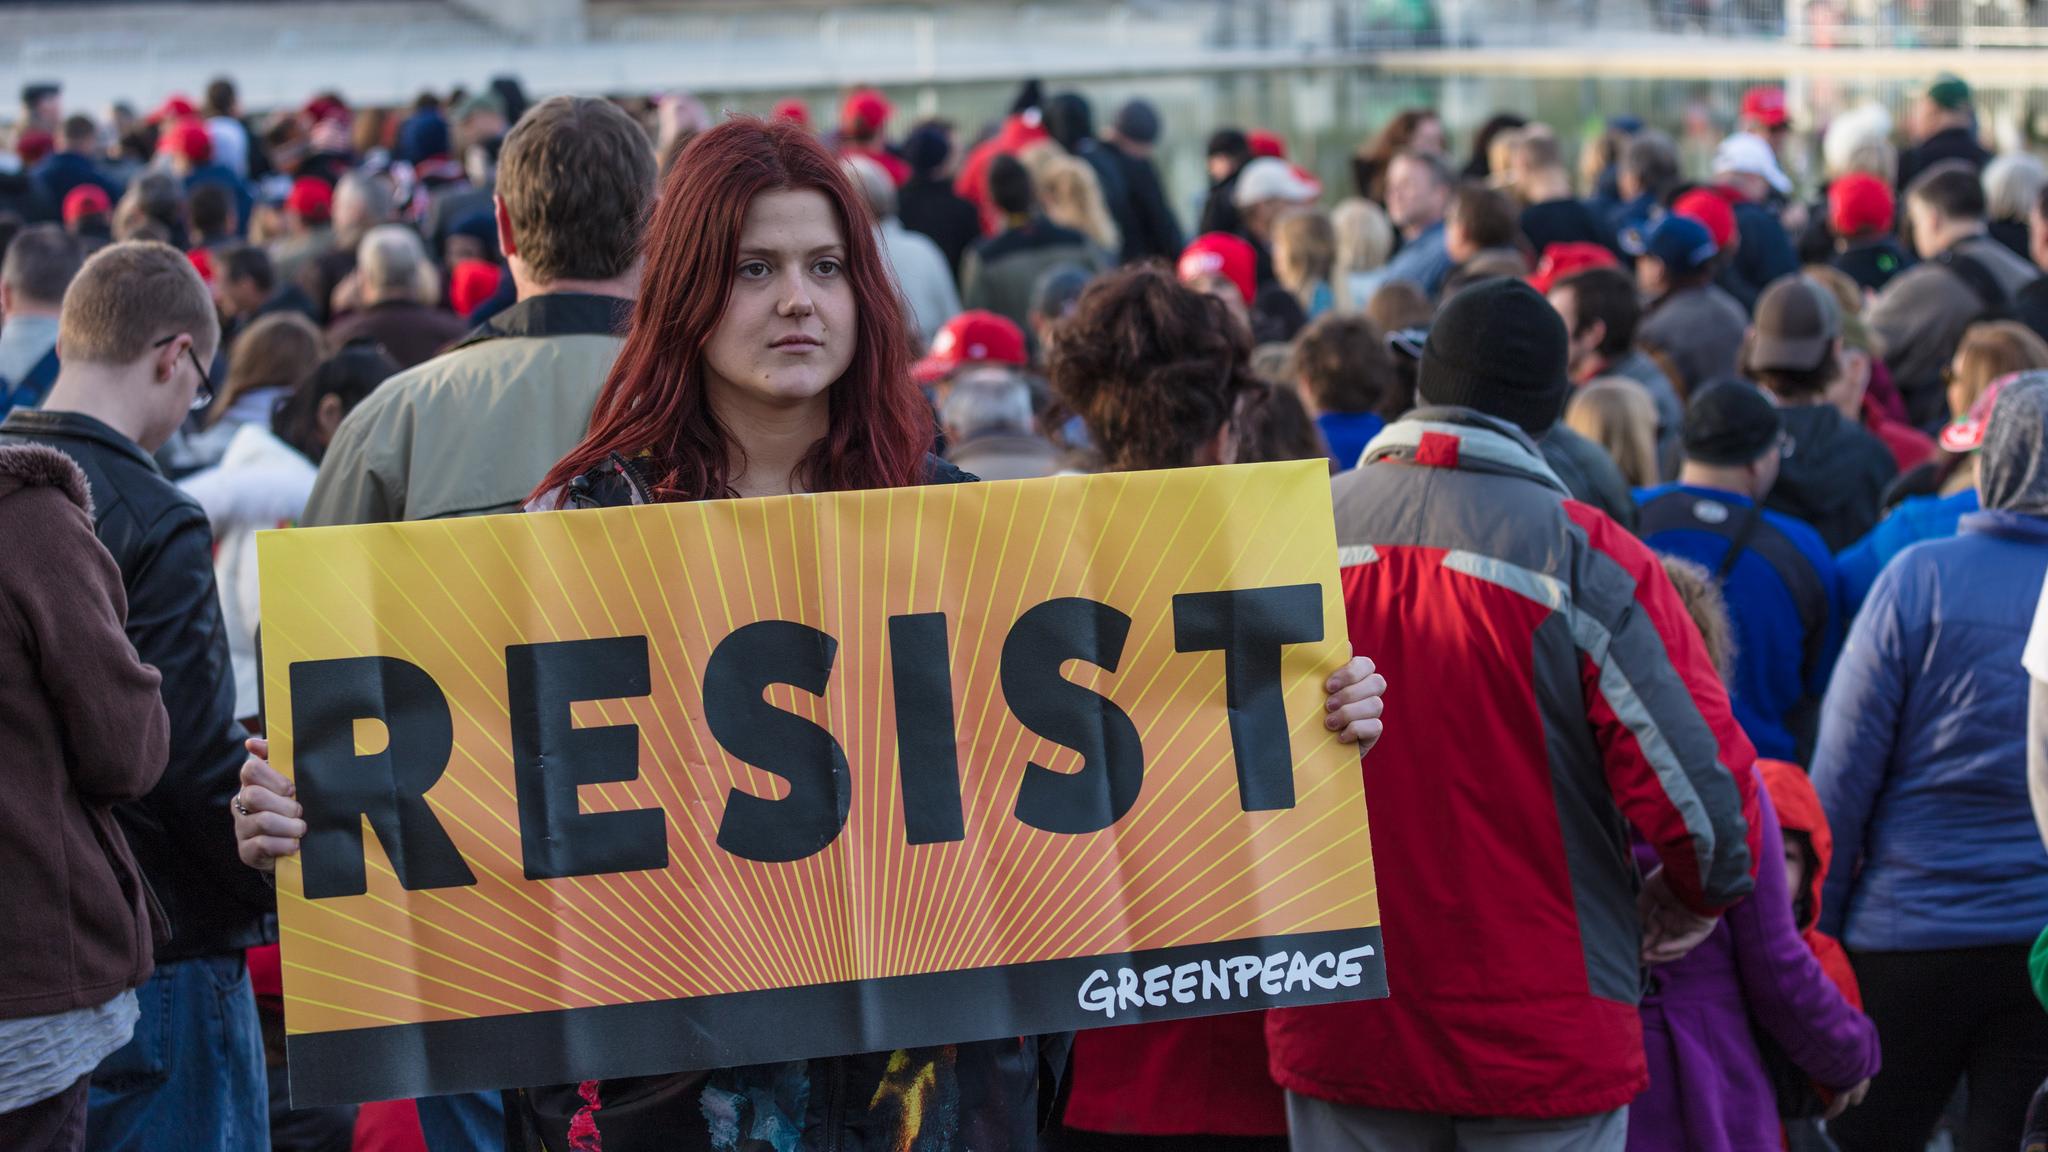 Strategic Non-Violent Resistance for Ministers - Quest for ...Non Violent Resistance Meaning